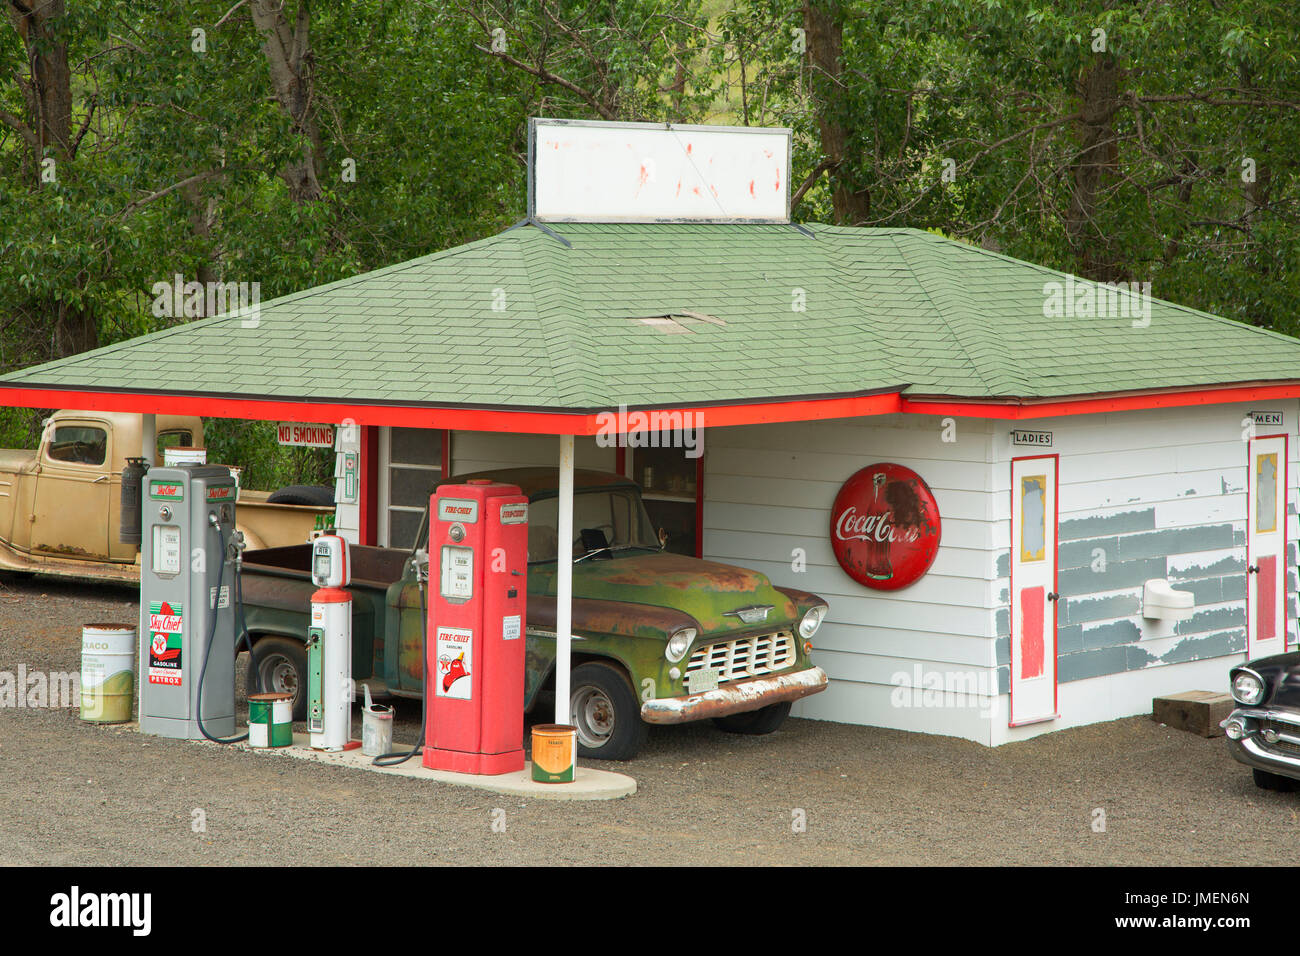 Tom Hennigar's vintage gas station, Whitman County, Washington Stock Photo  - Alamy